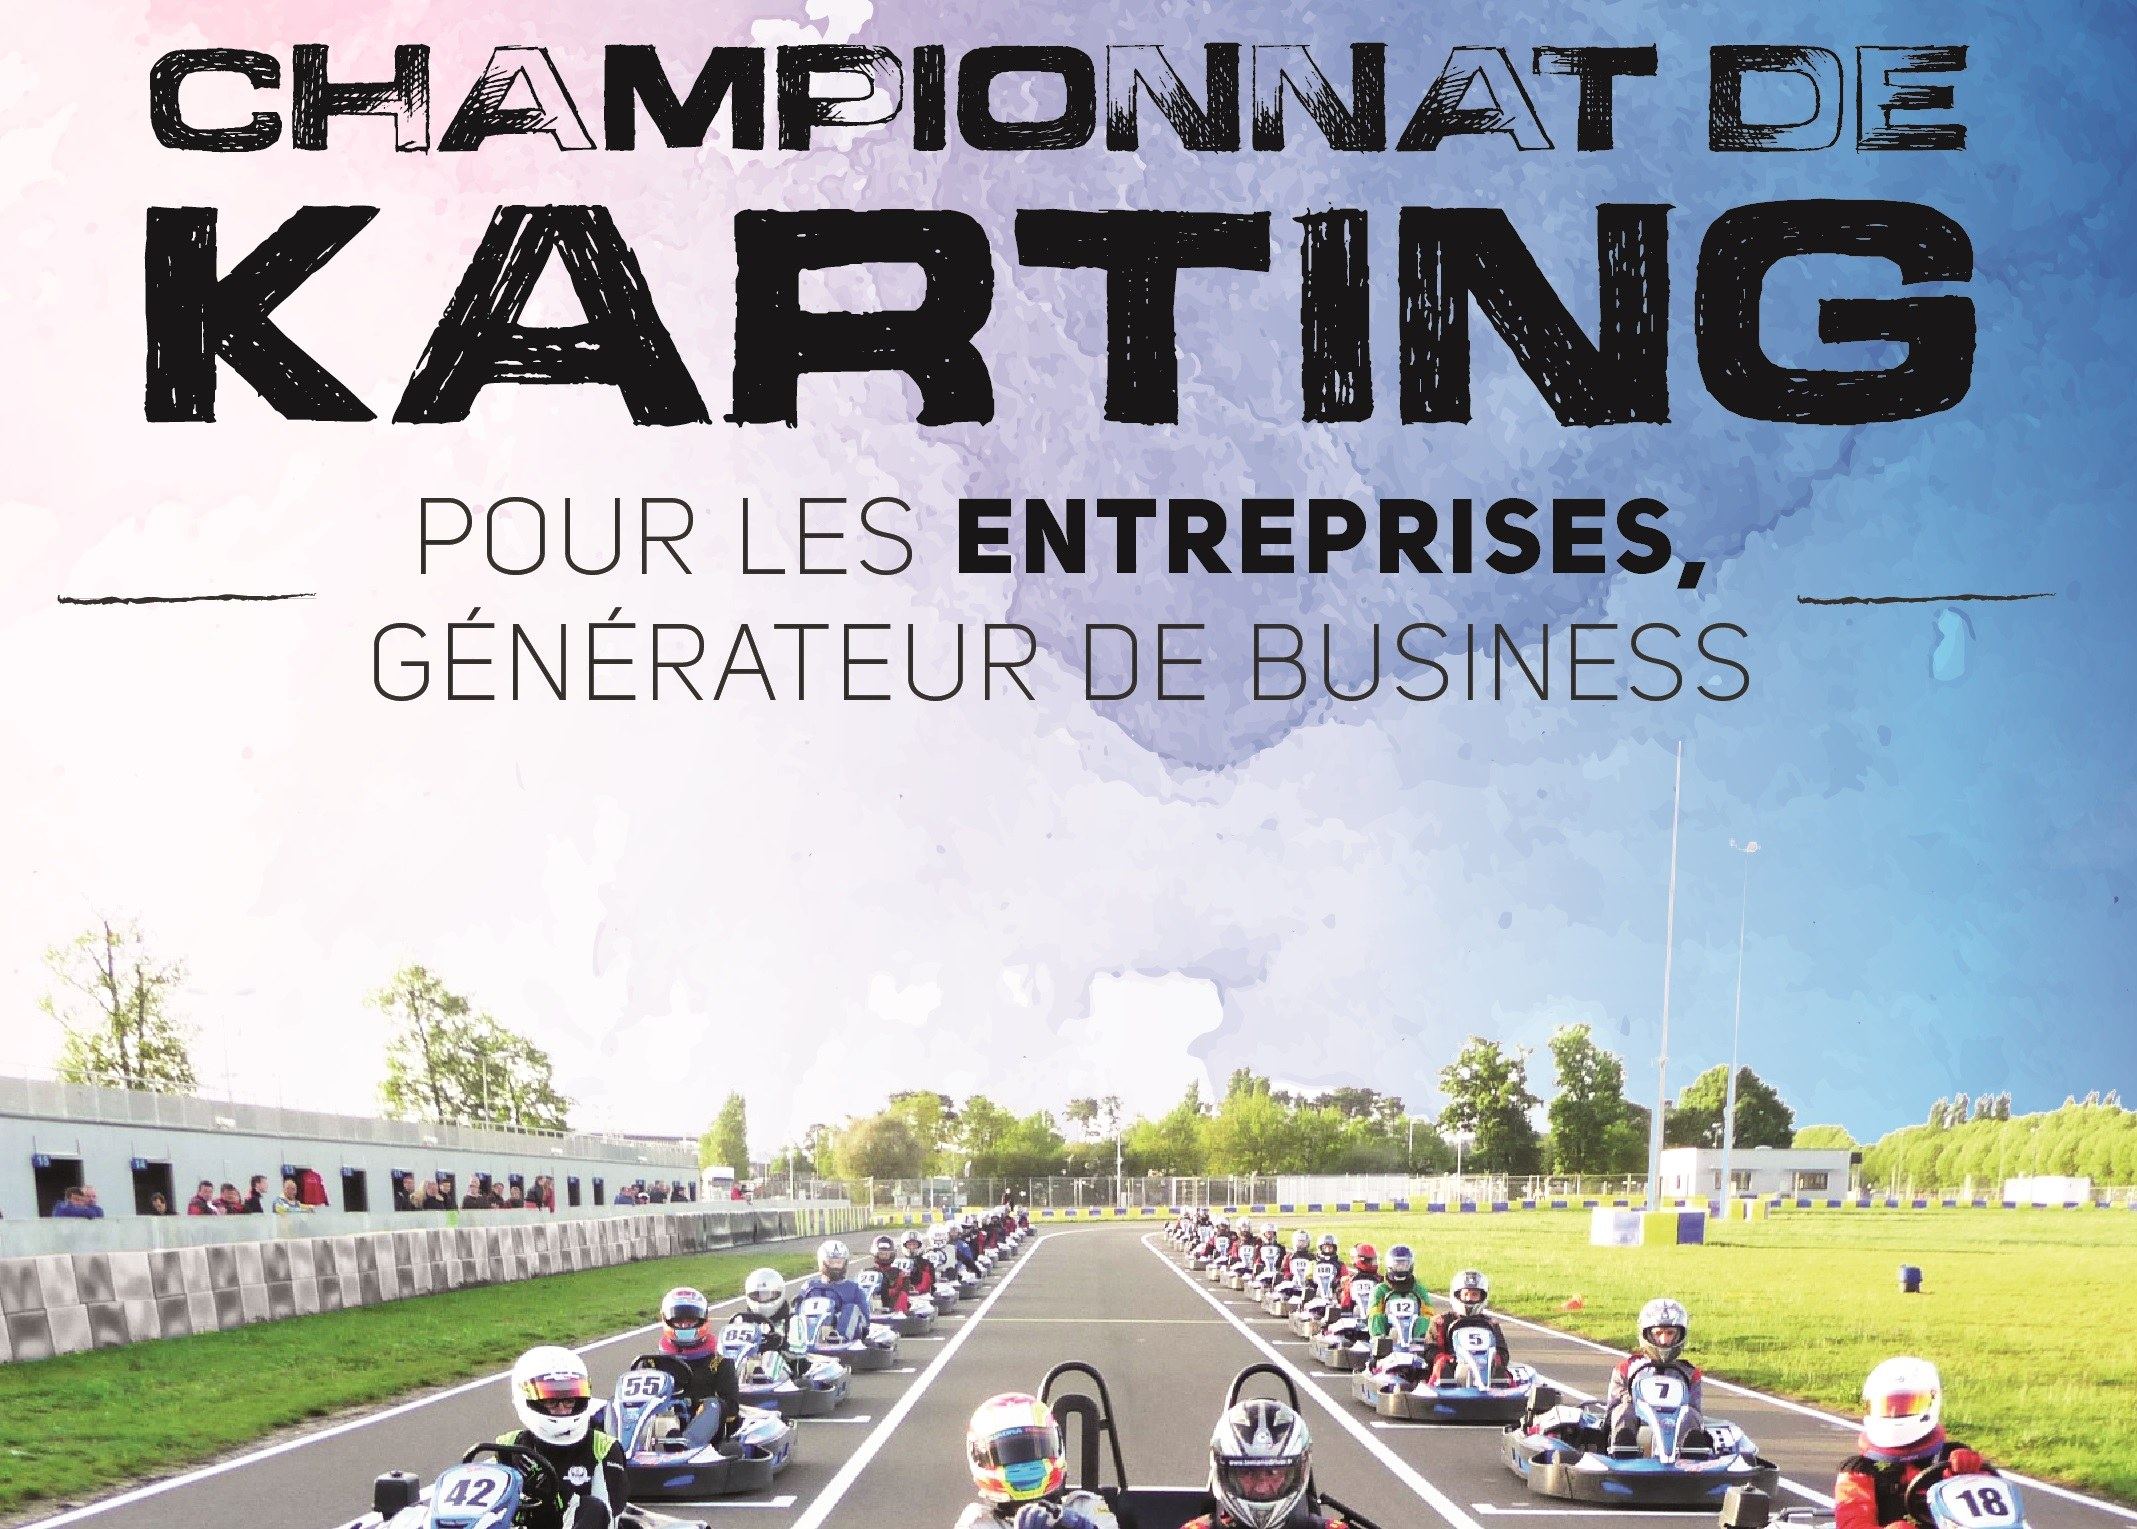 KARTING CENTER TOURS (37) Championnat interentreprises karting Tours 37